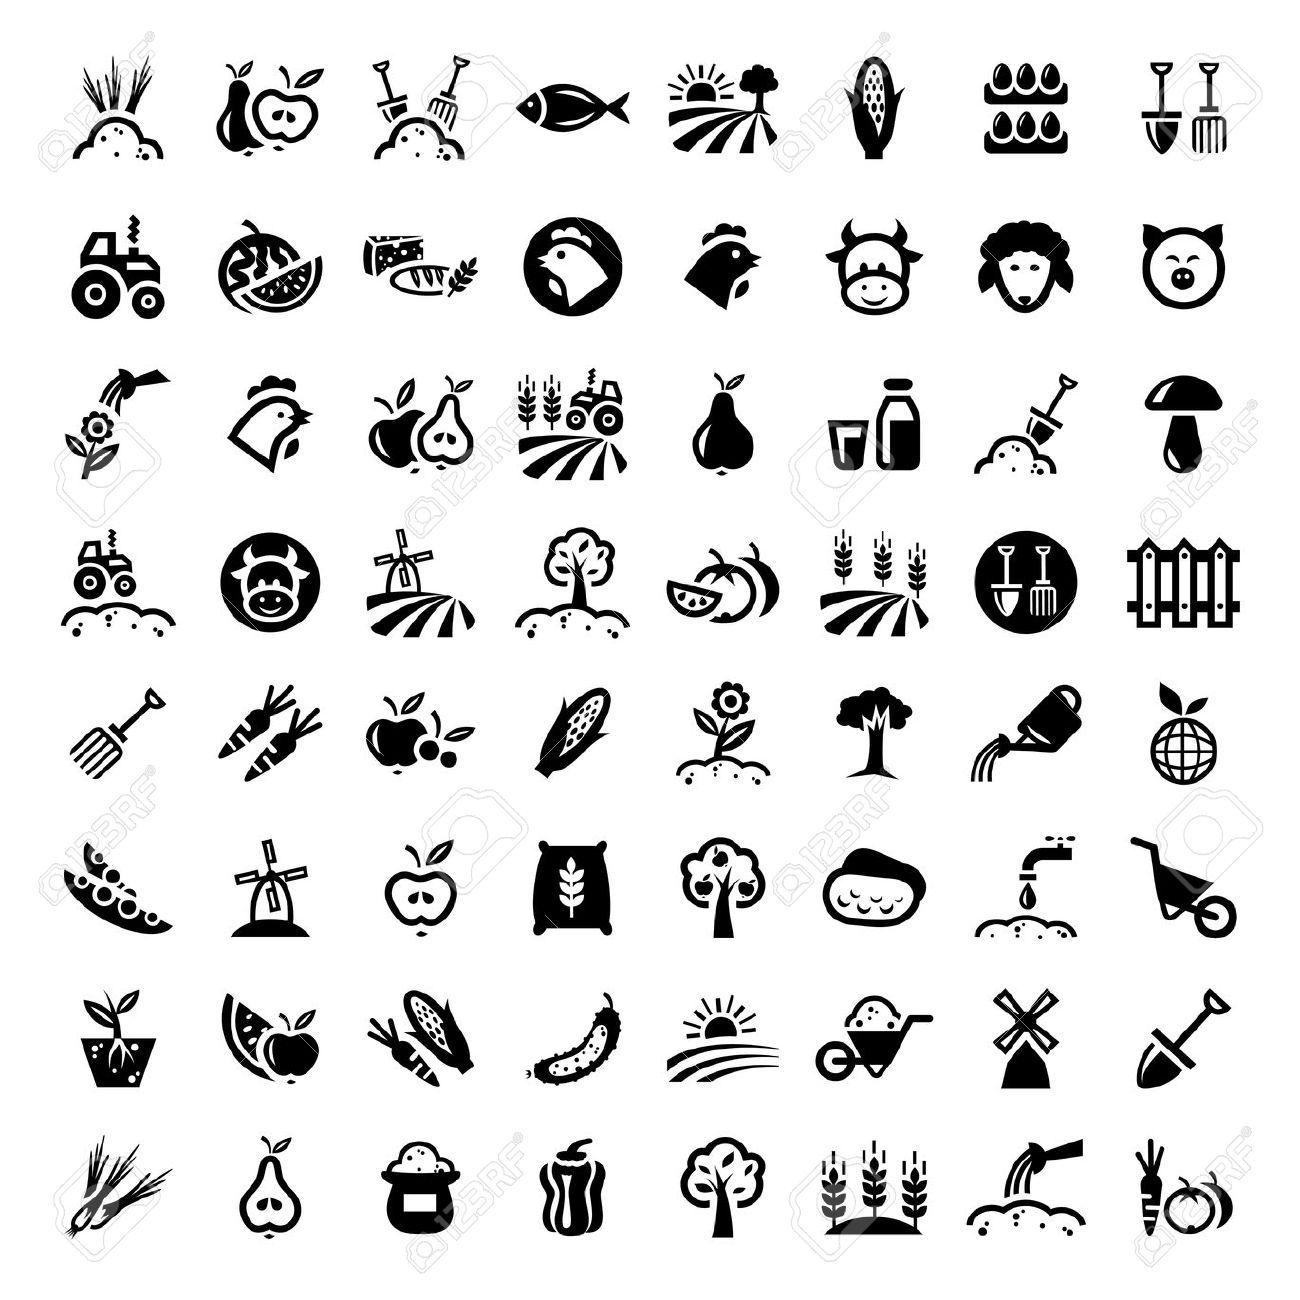 Crops Icon Google Search Crafts Set Glyph Logos Electric Circuit Symbol Element Illustration Vectorielle Libre De Big Agriculture Icons Vector 1176315 By Chistoprudnaya On Vectorstock